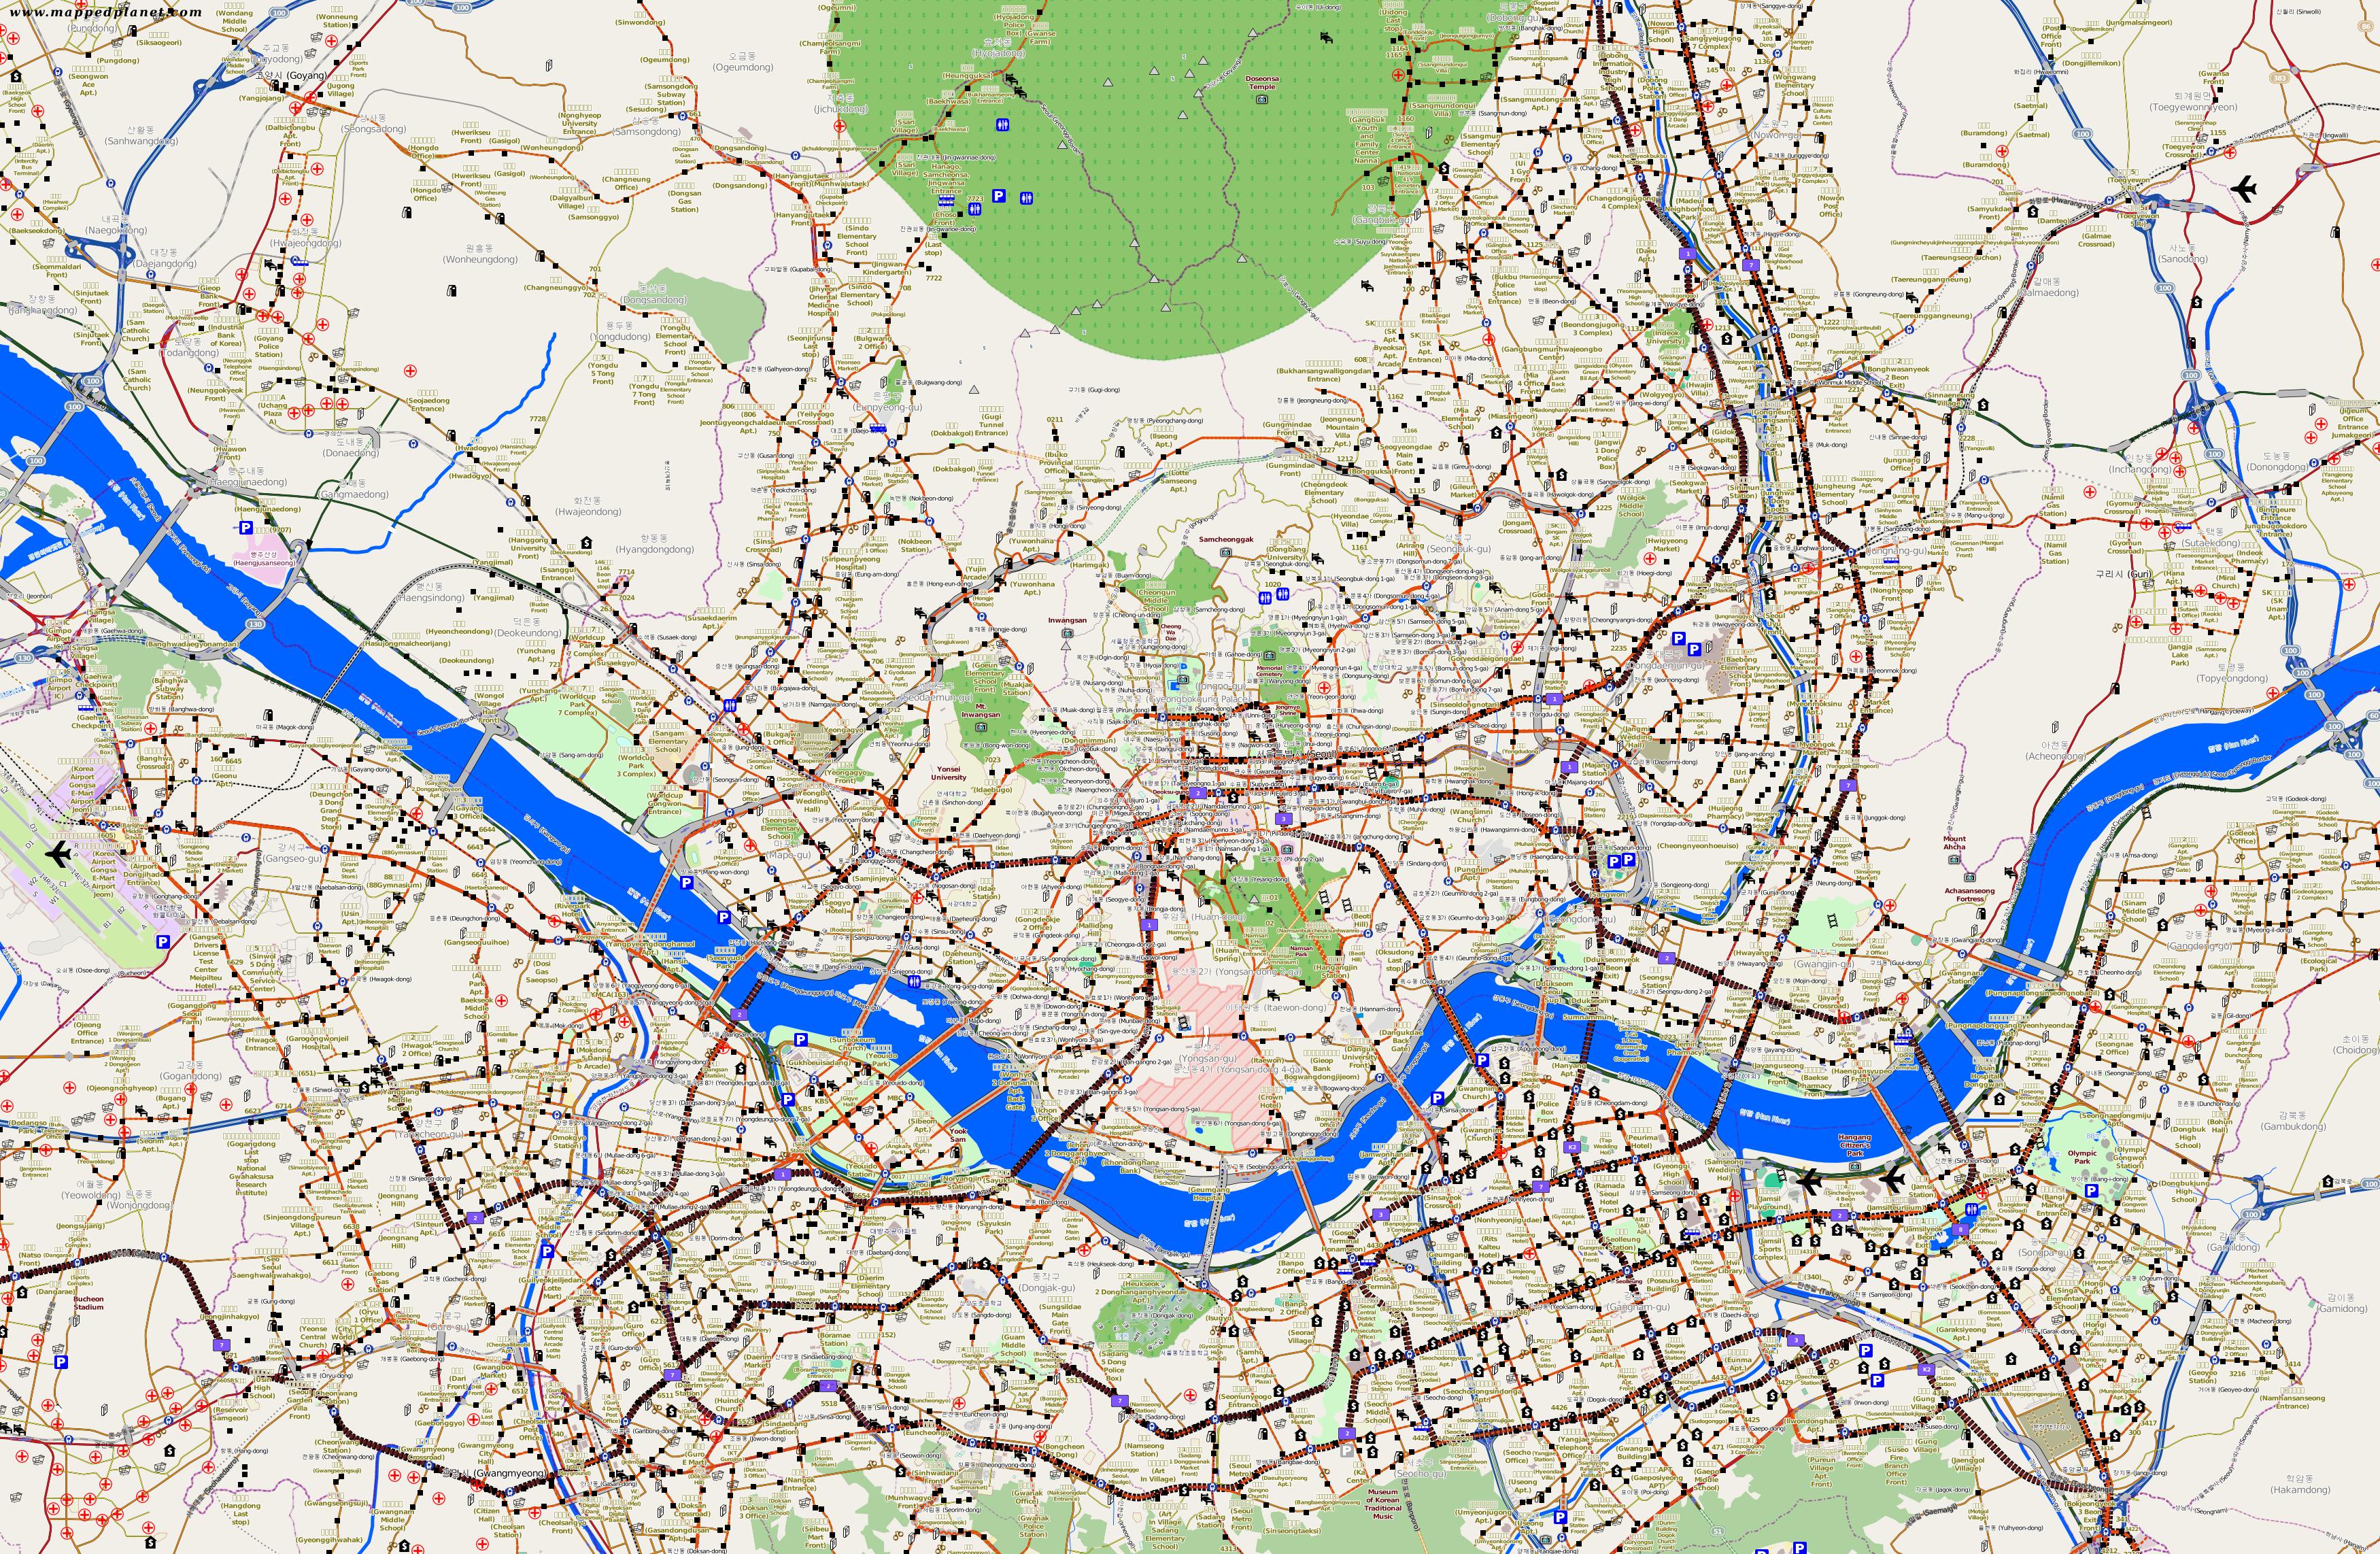 map in korea with Citymaps 167 Seoul on Emblem Of Turkey 01 additionally Koper Slovenia further Korea furthermore Us Engineering University Map likewise Friday Pm Hot Clicks Bre Tiesi Donald Trump Inauguration.